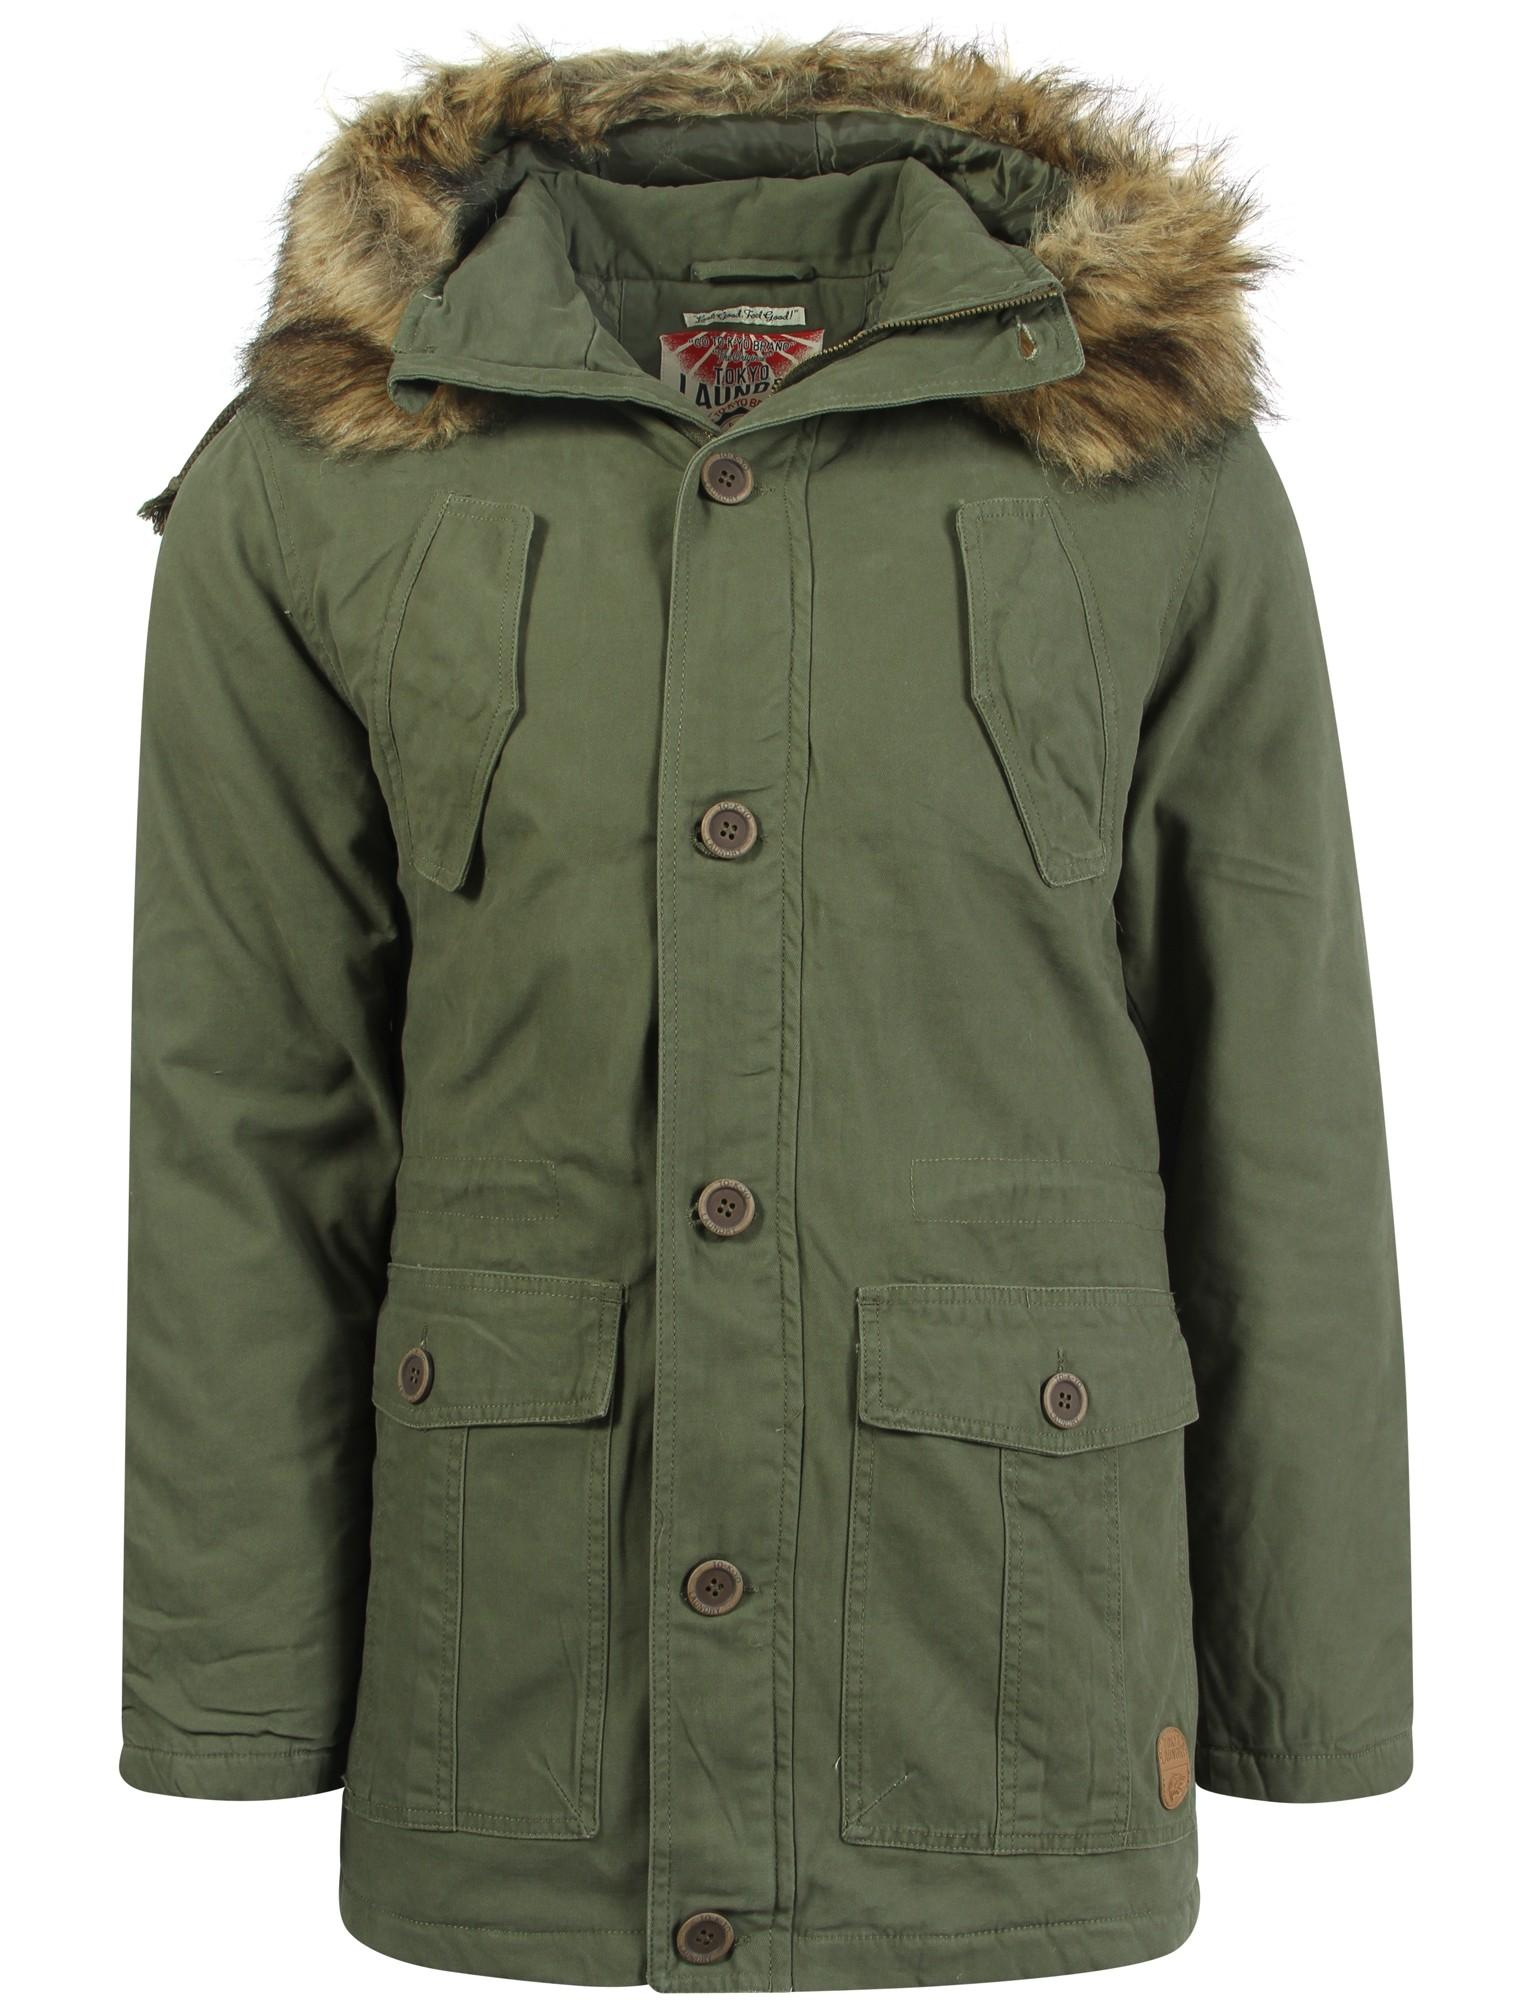 Men's Tokyo Laundry Fur Trim Hooded Parka Jacket Size S - XXL | eBay